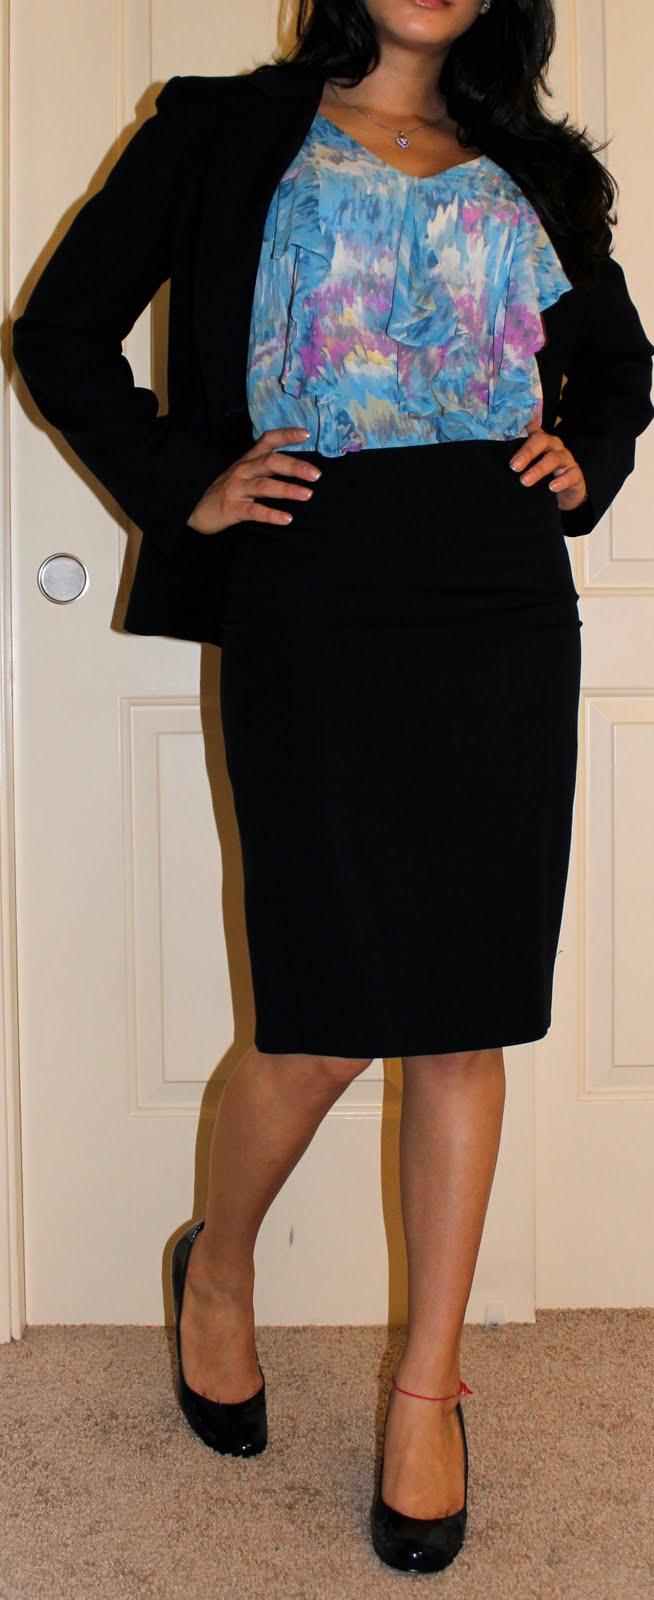 Skirt Suit on Petite Blogger